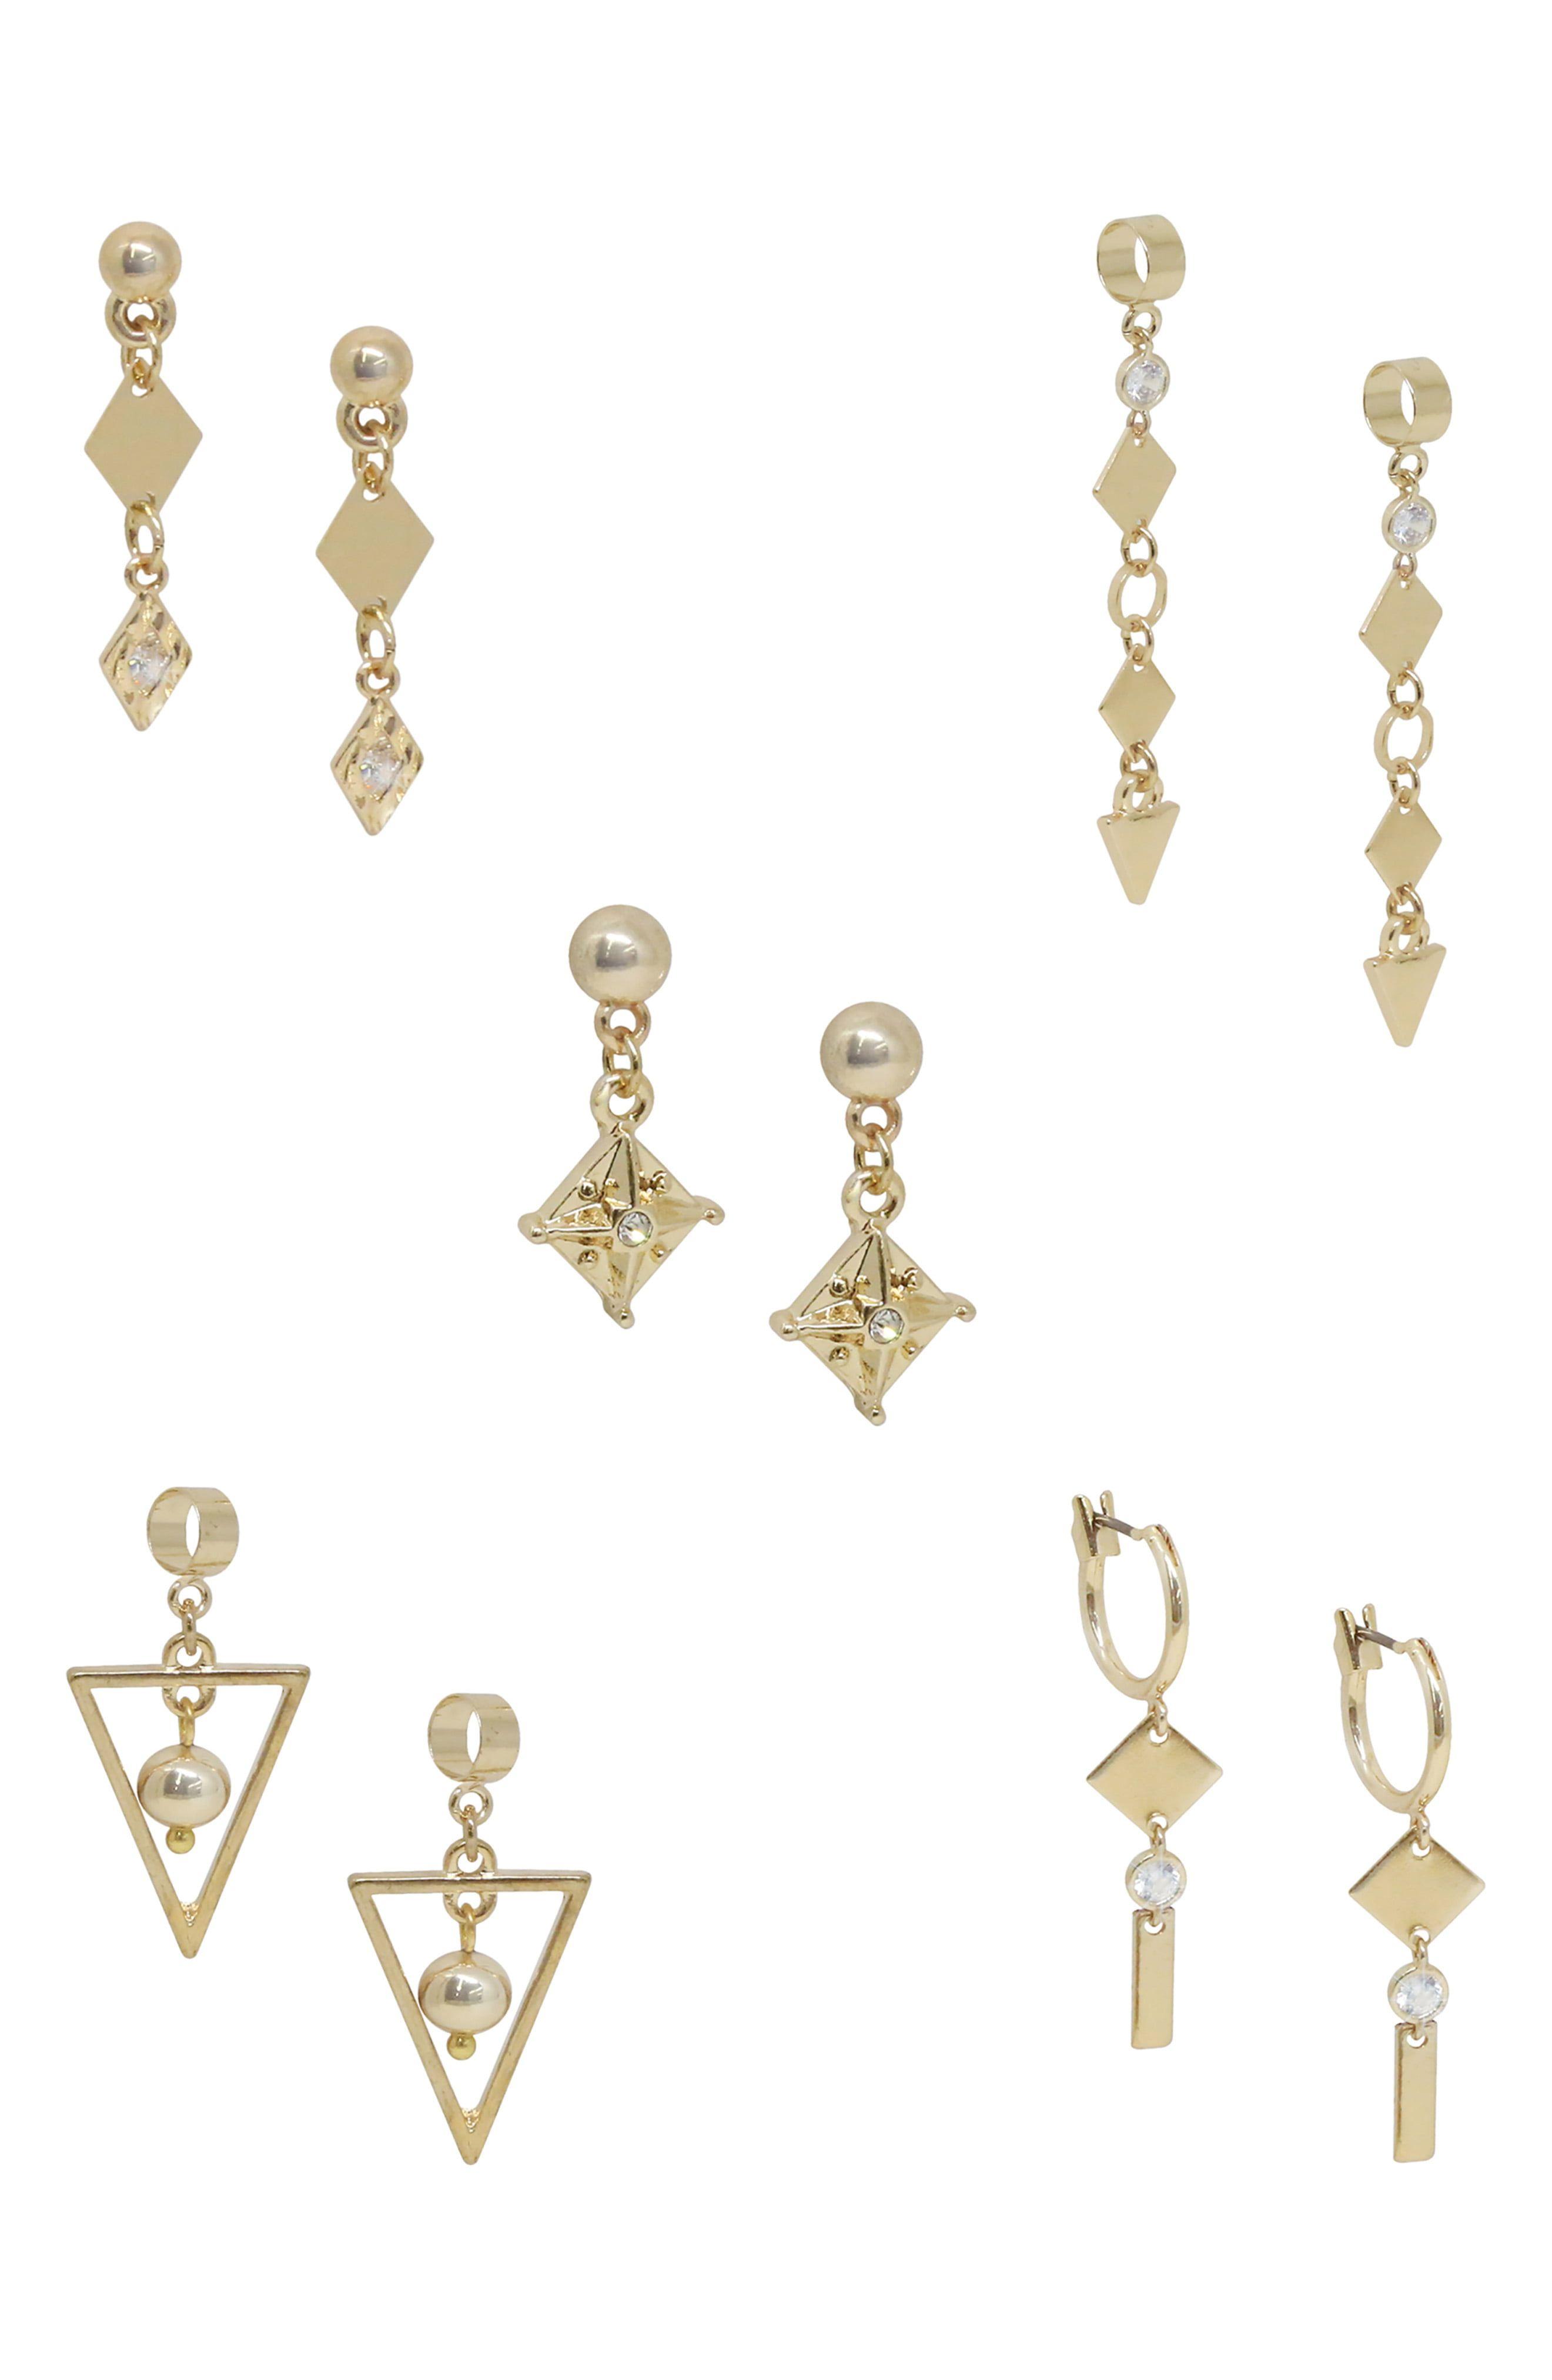 81f5ae942 Ettika Set of 5 Geometric Drop Earrings in 2019 | Products | Drop ...